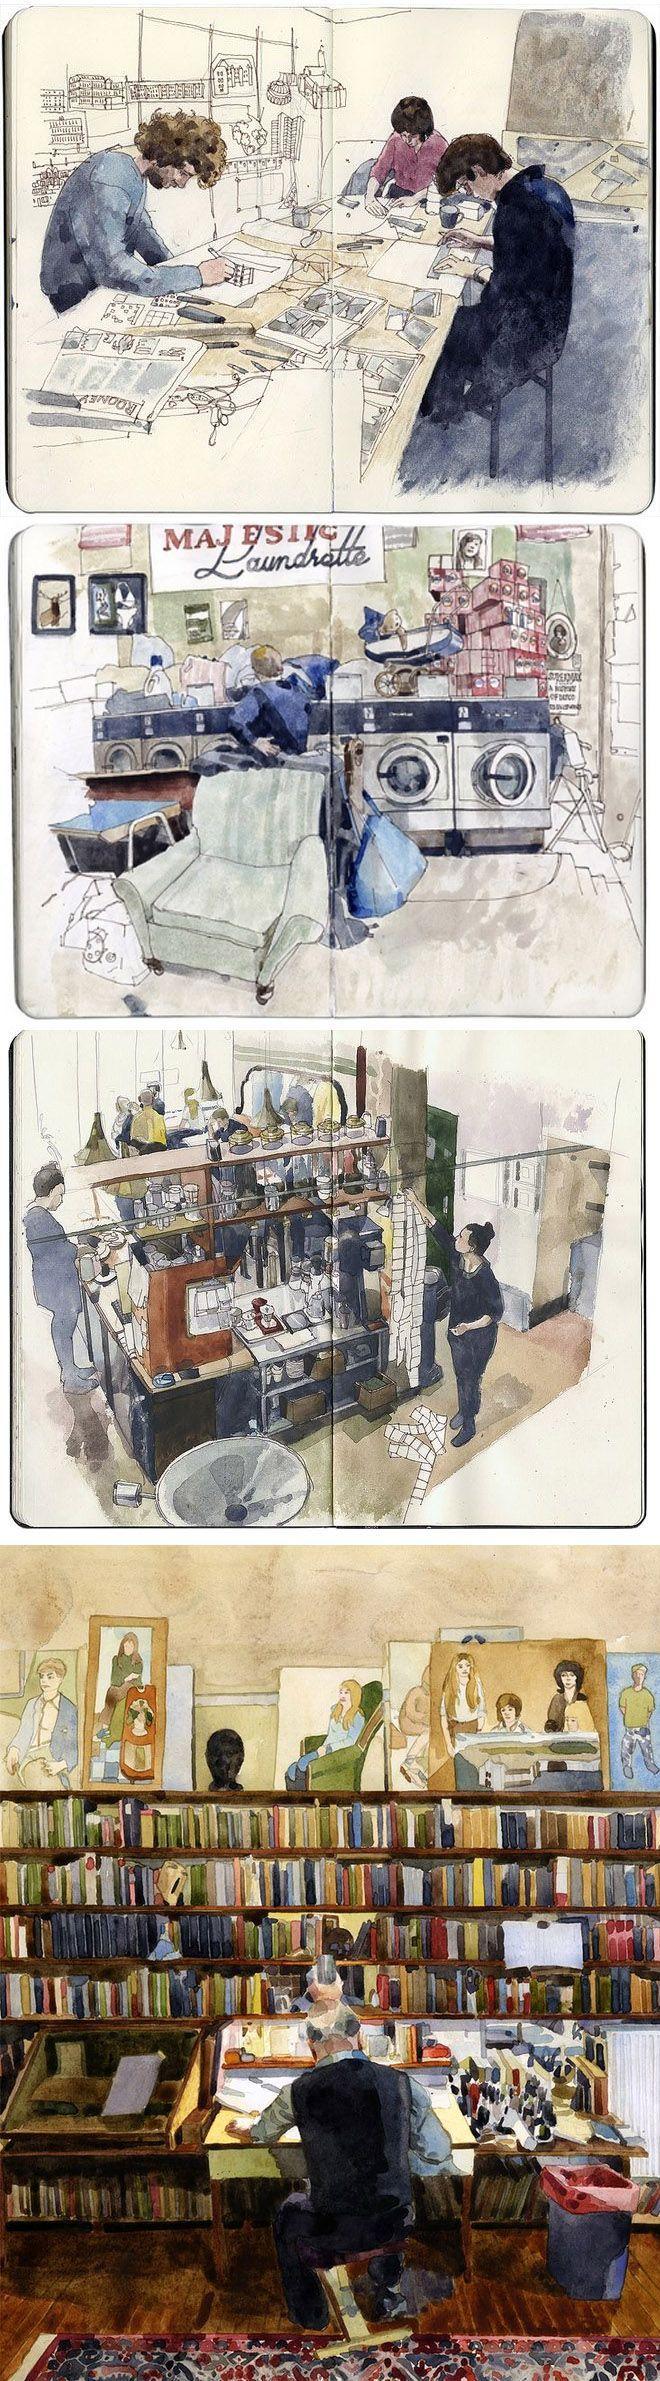 illustrated by Wil Freeborn #sketchbook #journal https://www.flickr.com/photos/ghostschool/